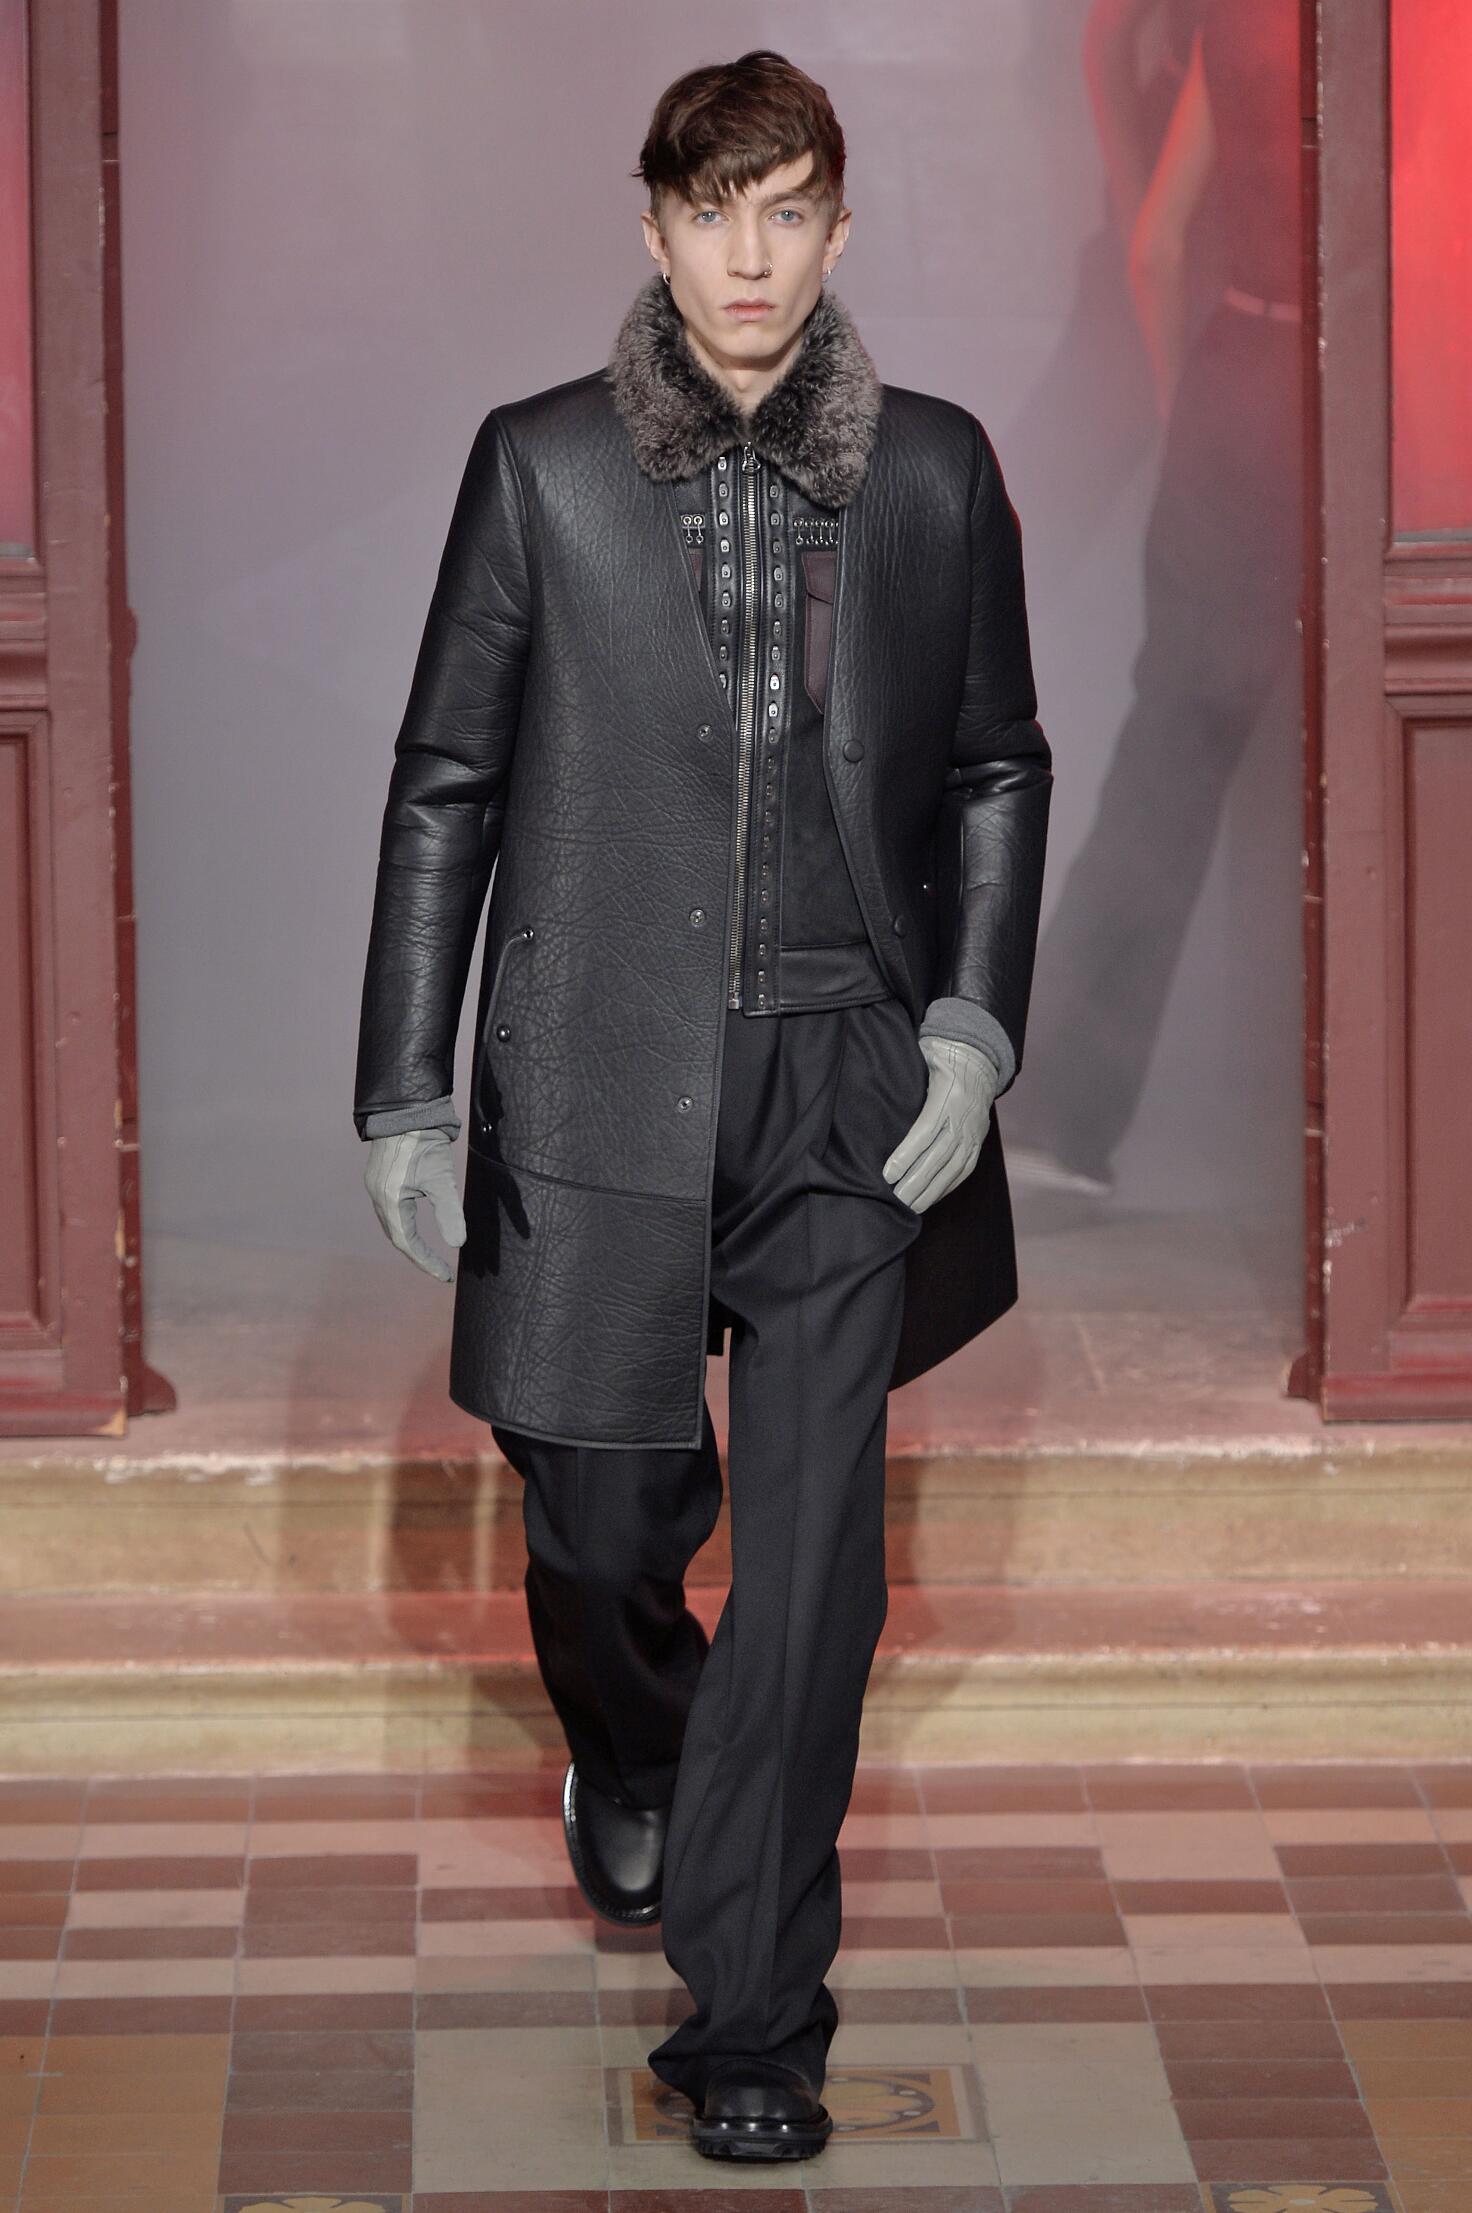 Lanvin Fall Winter 2015 16 Men's Collection Paris Fashion Week